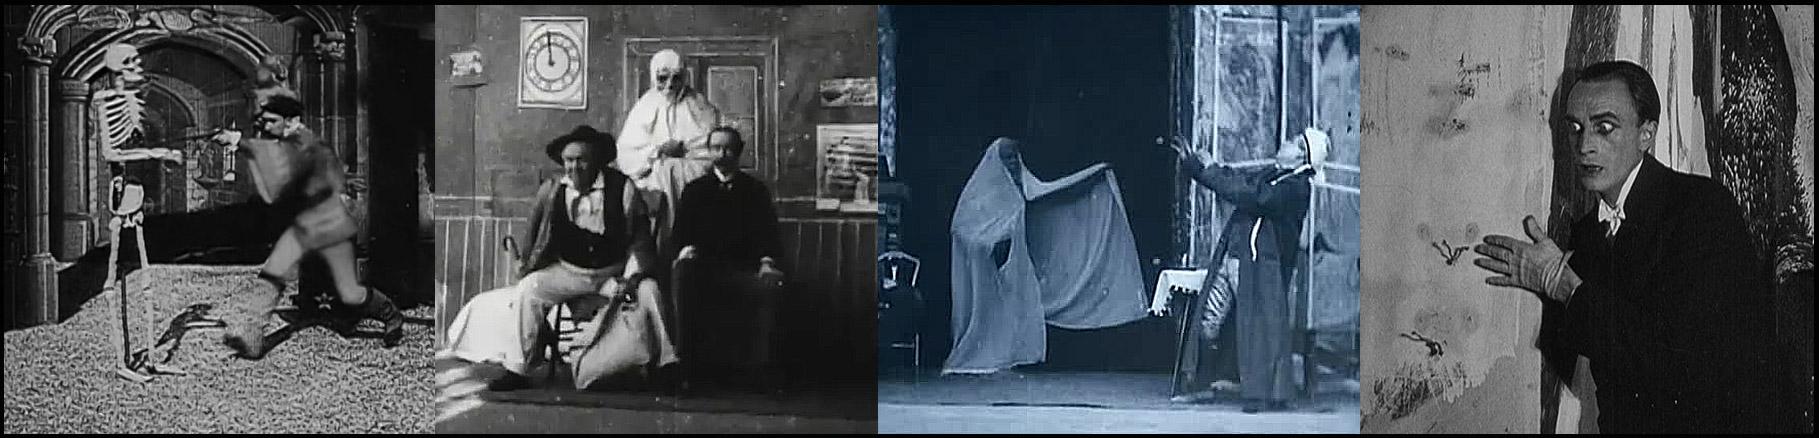 Geisterfilm Stummfilm